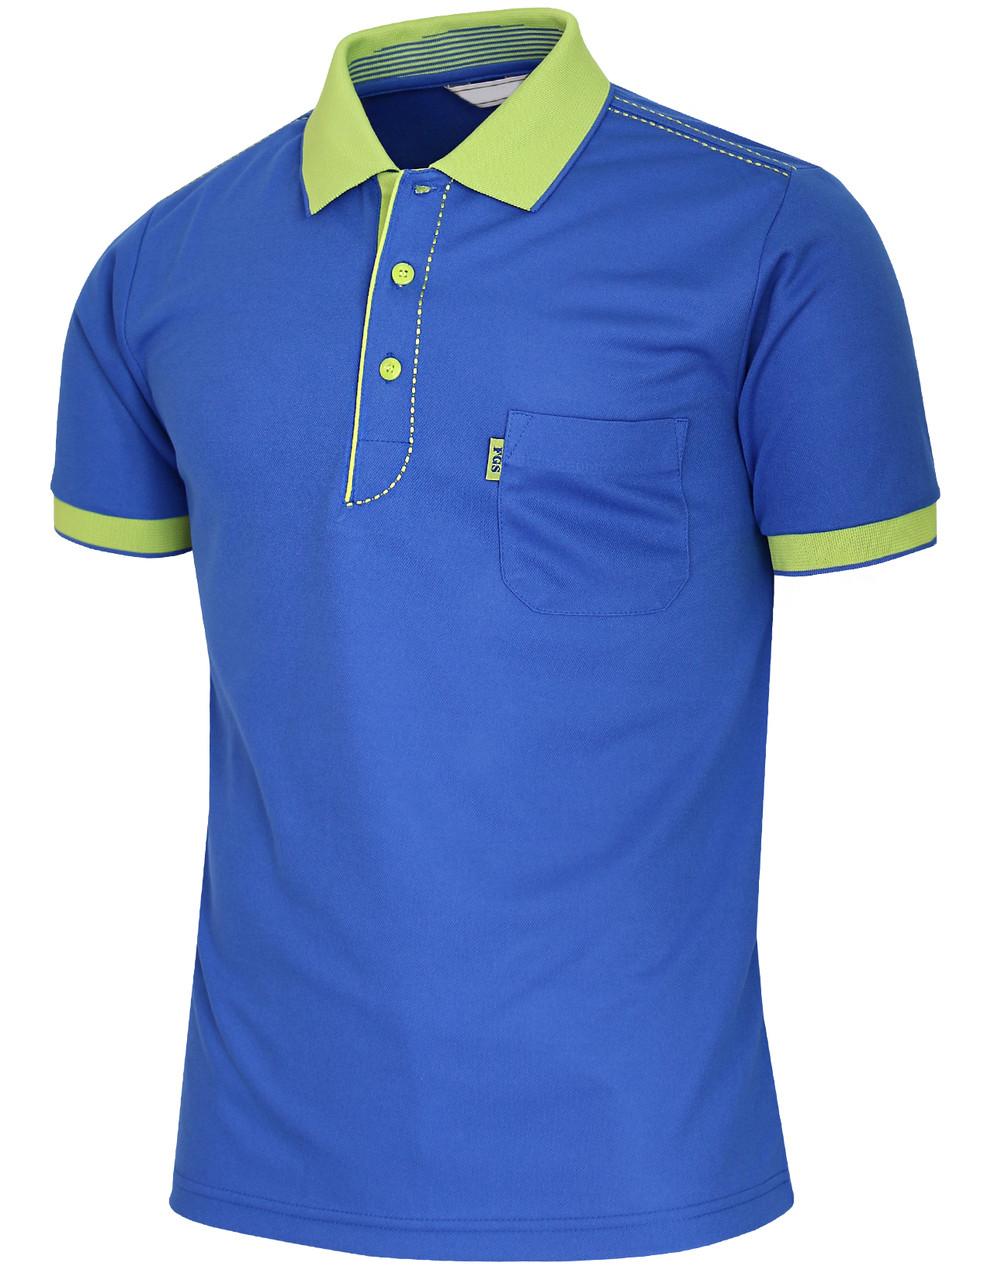 9ba84c5b Short Sleeve Dri Fit Stitch Point Polo Shirt-Unisex